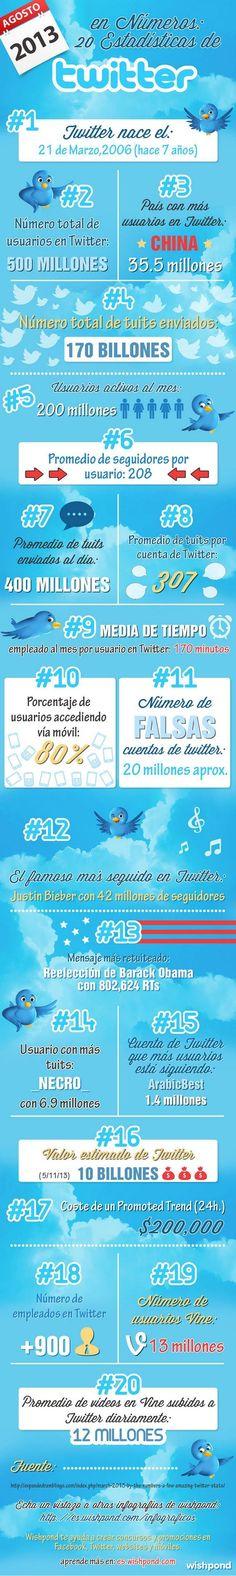 Cifras actualizadas de Twitter 2013